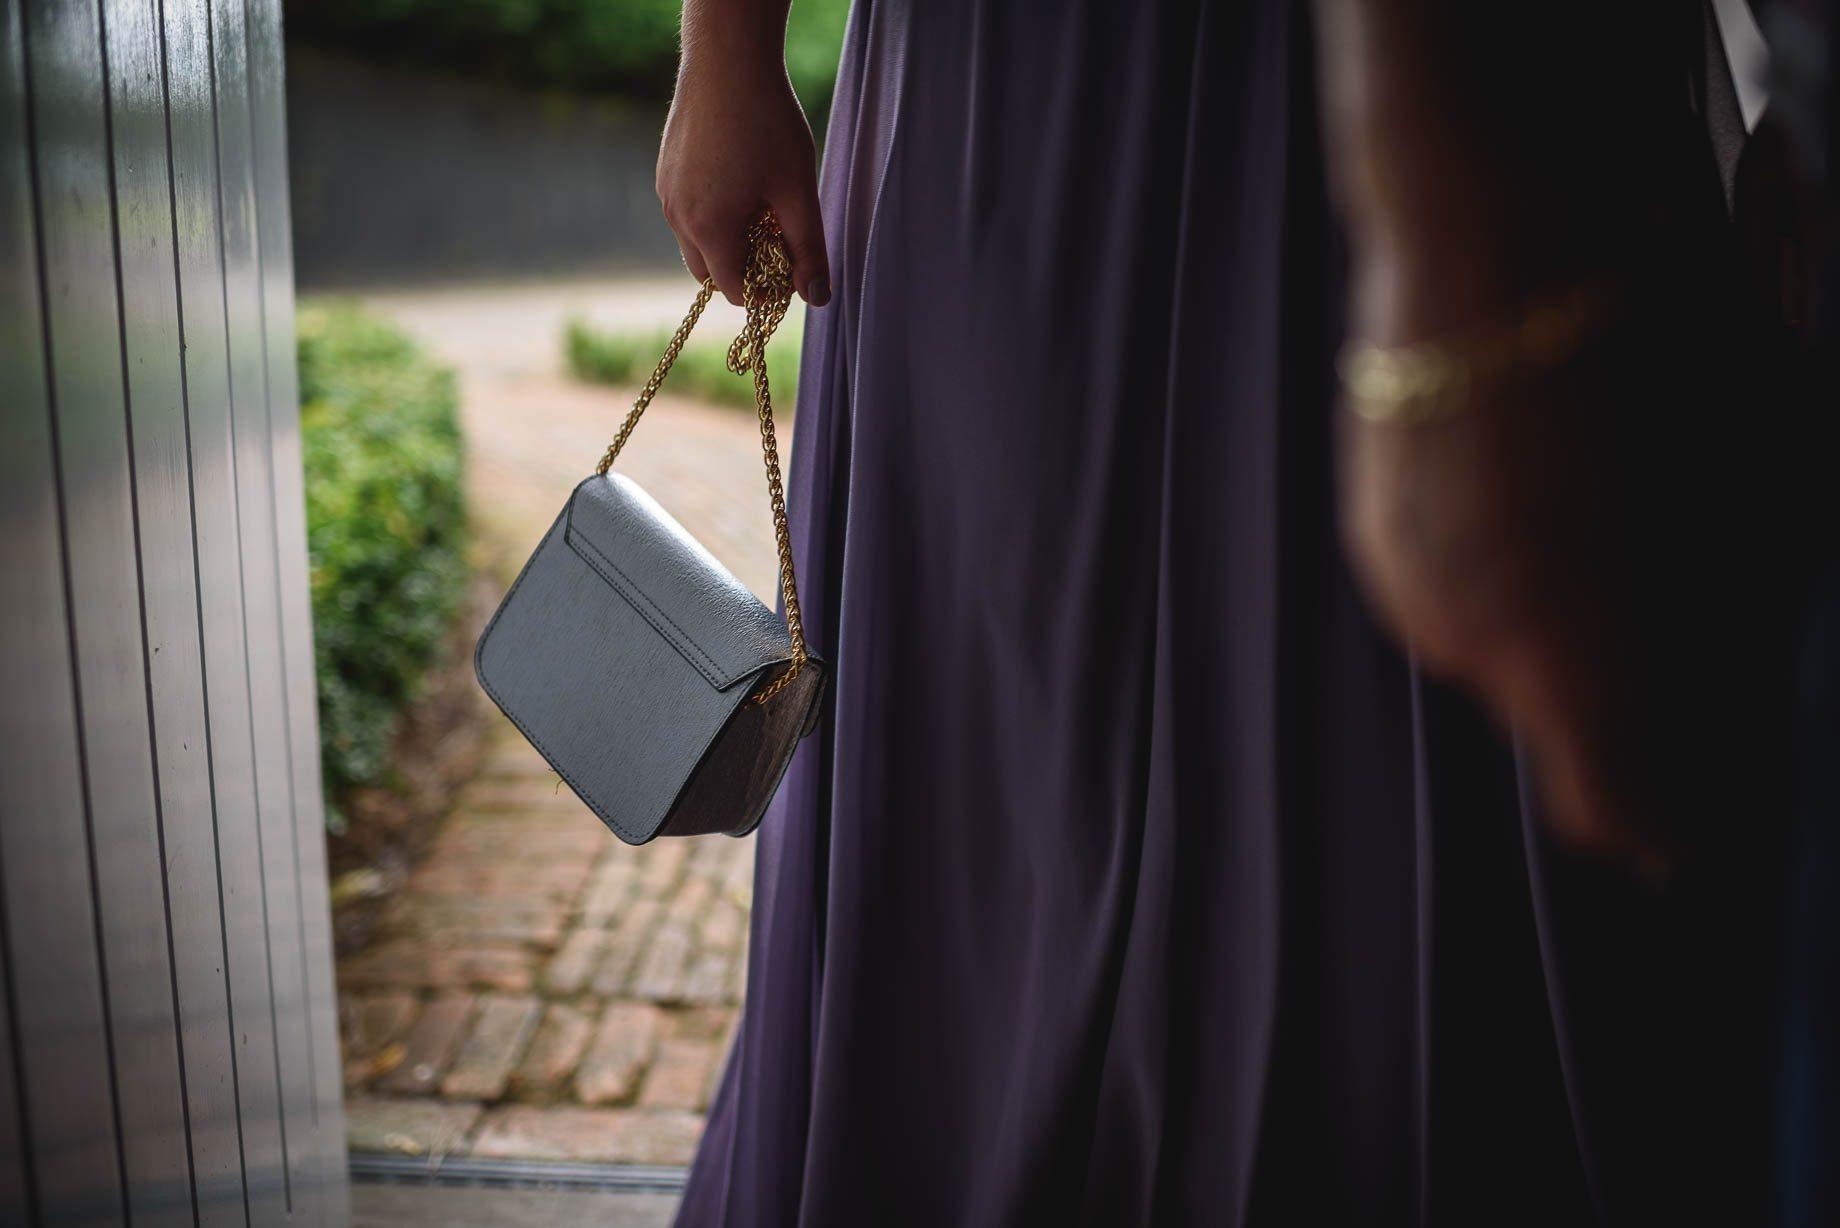 Gaynes Park wedding photography - Guy Collier Photography - Rachel and Jon (38 of 169)